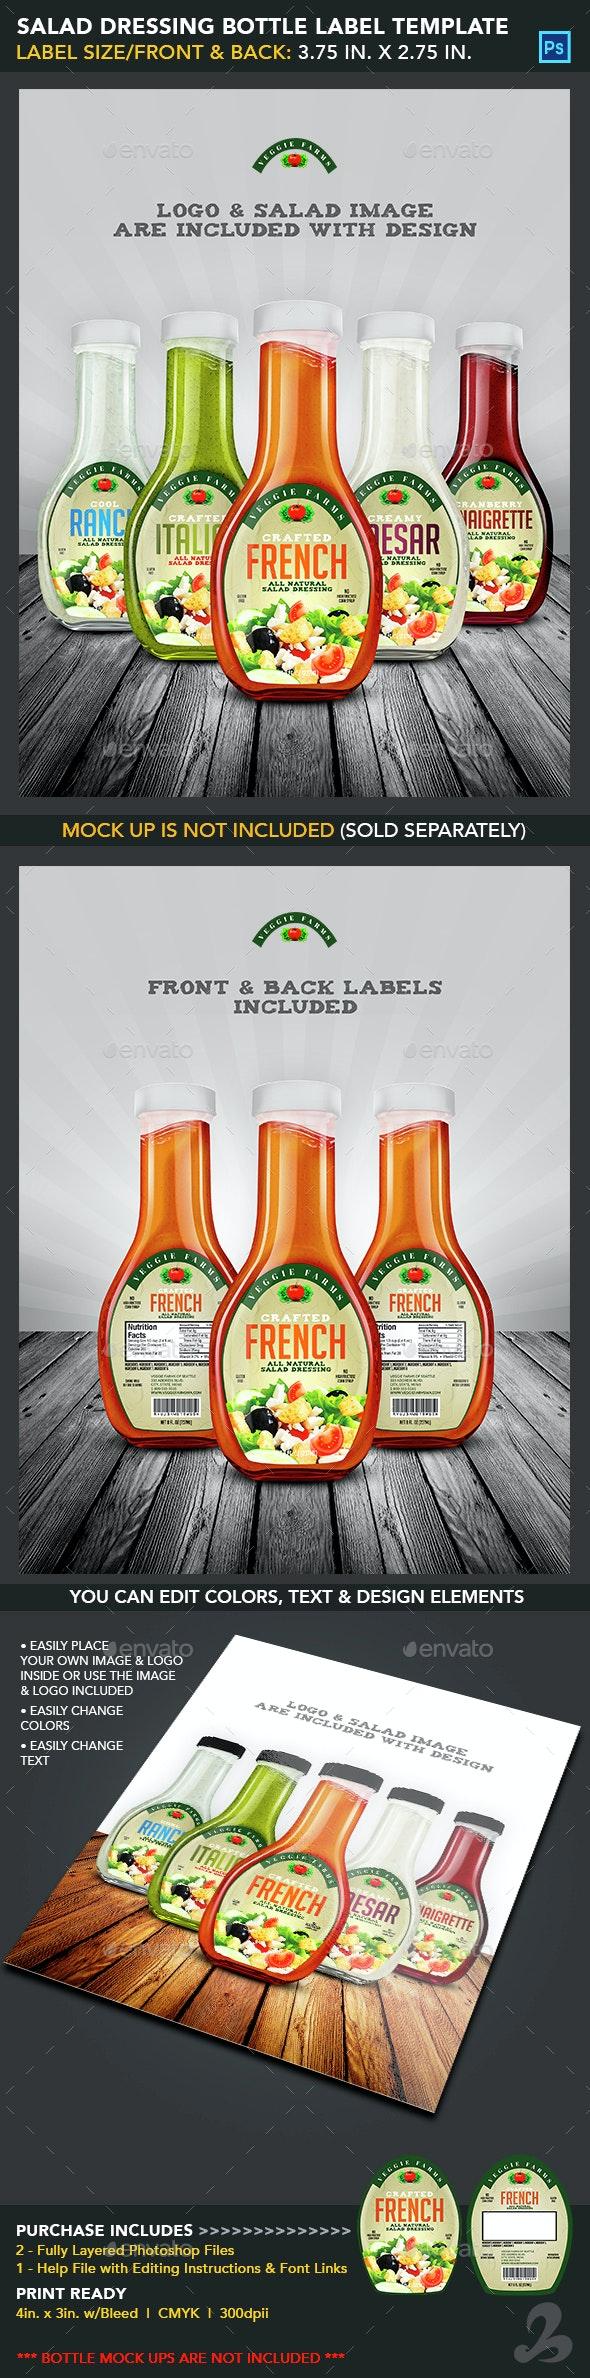 Salad Dressing Bottle Label Templates - Packaging Print Templates